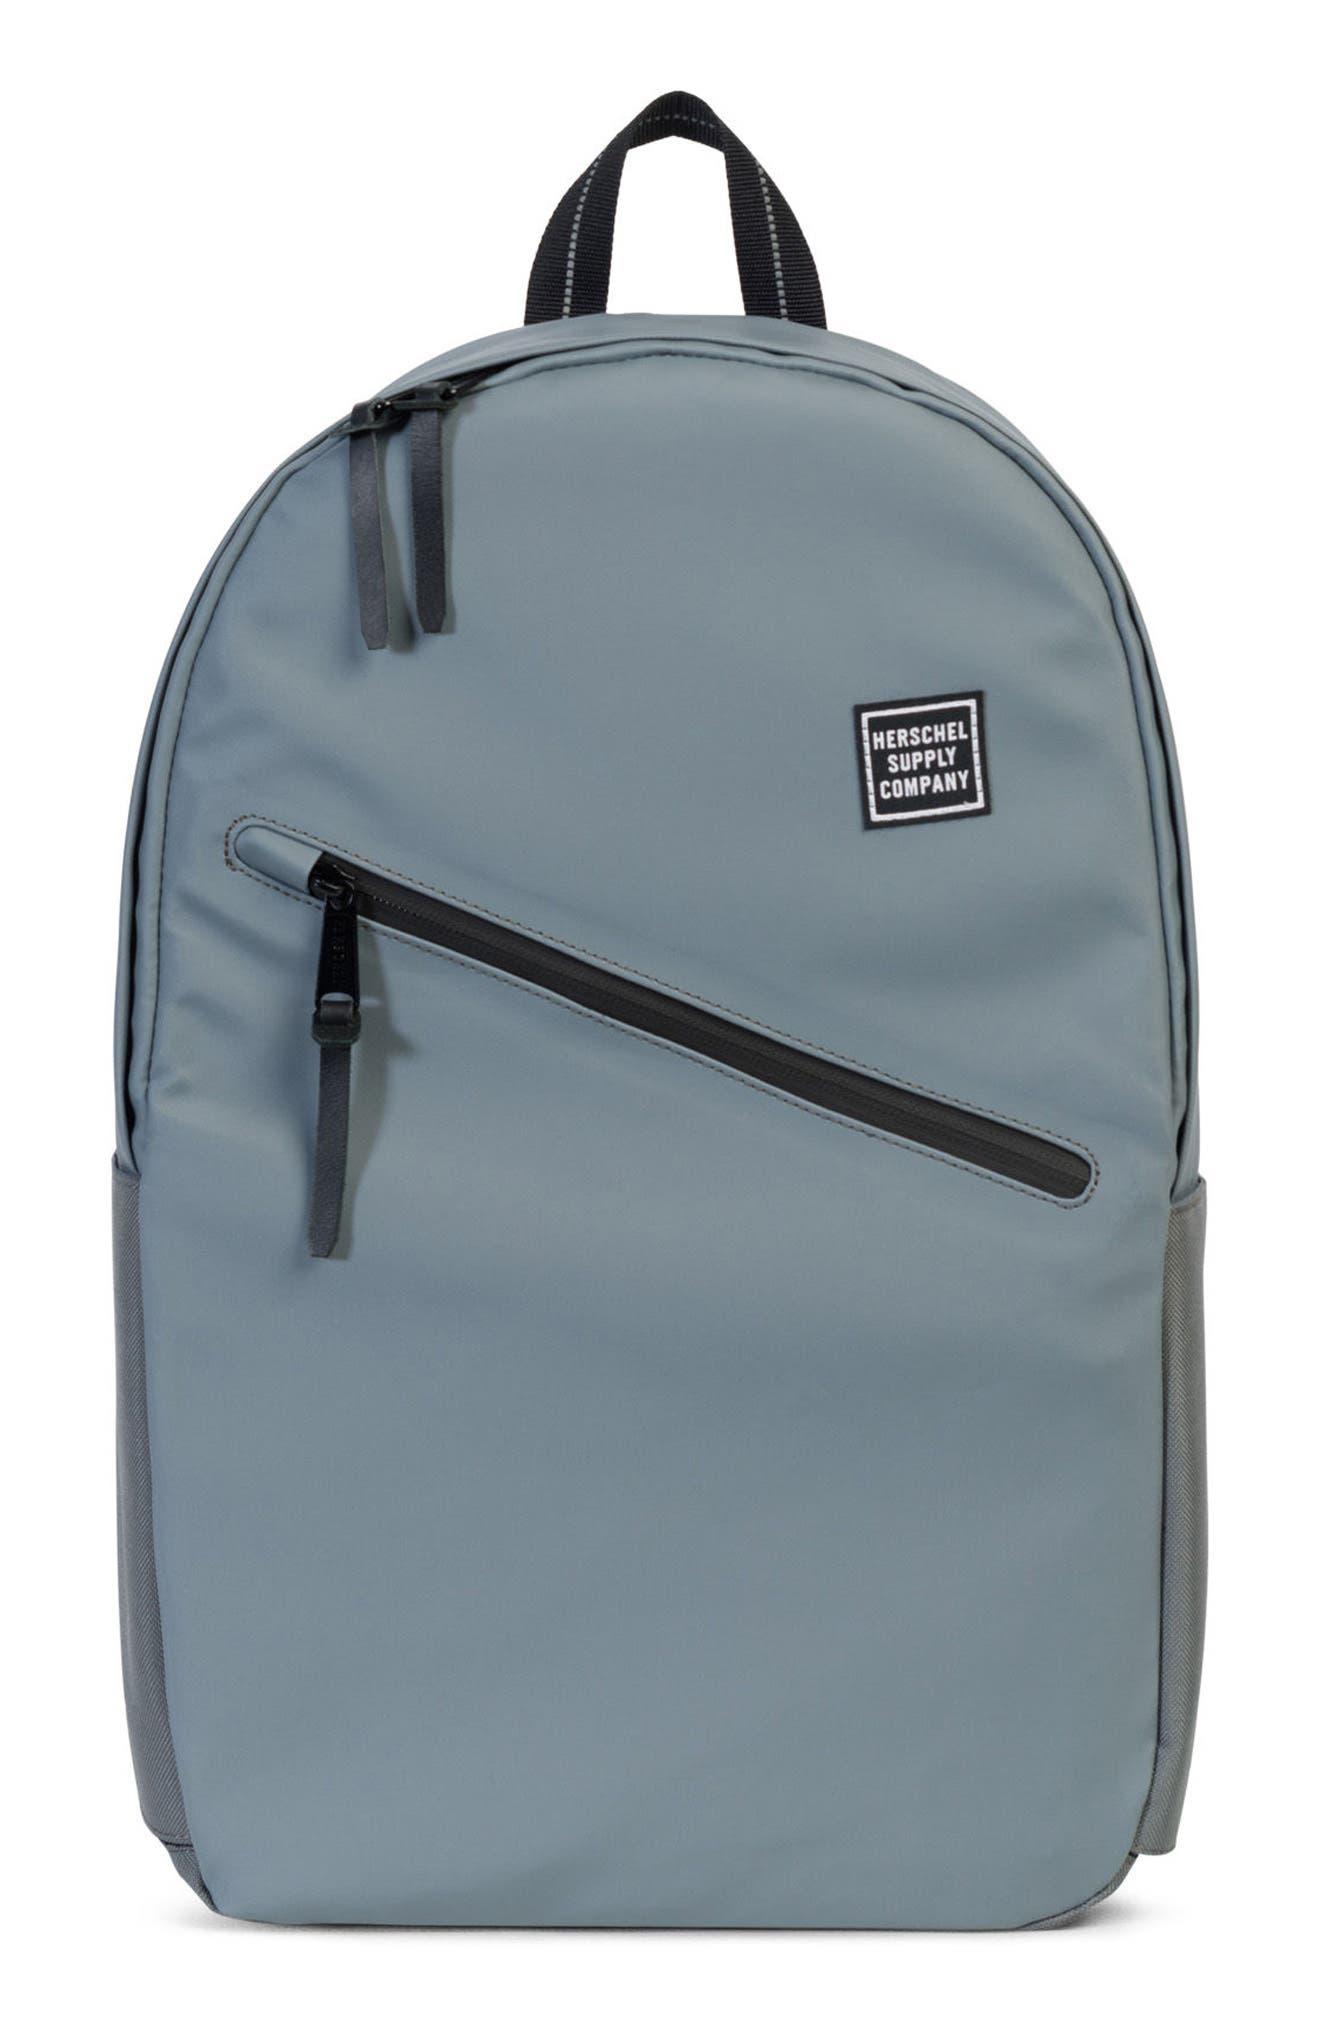 Herschel Supply Co. Parker Studio Collection Backpack